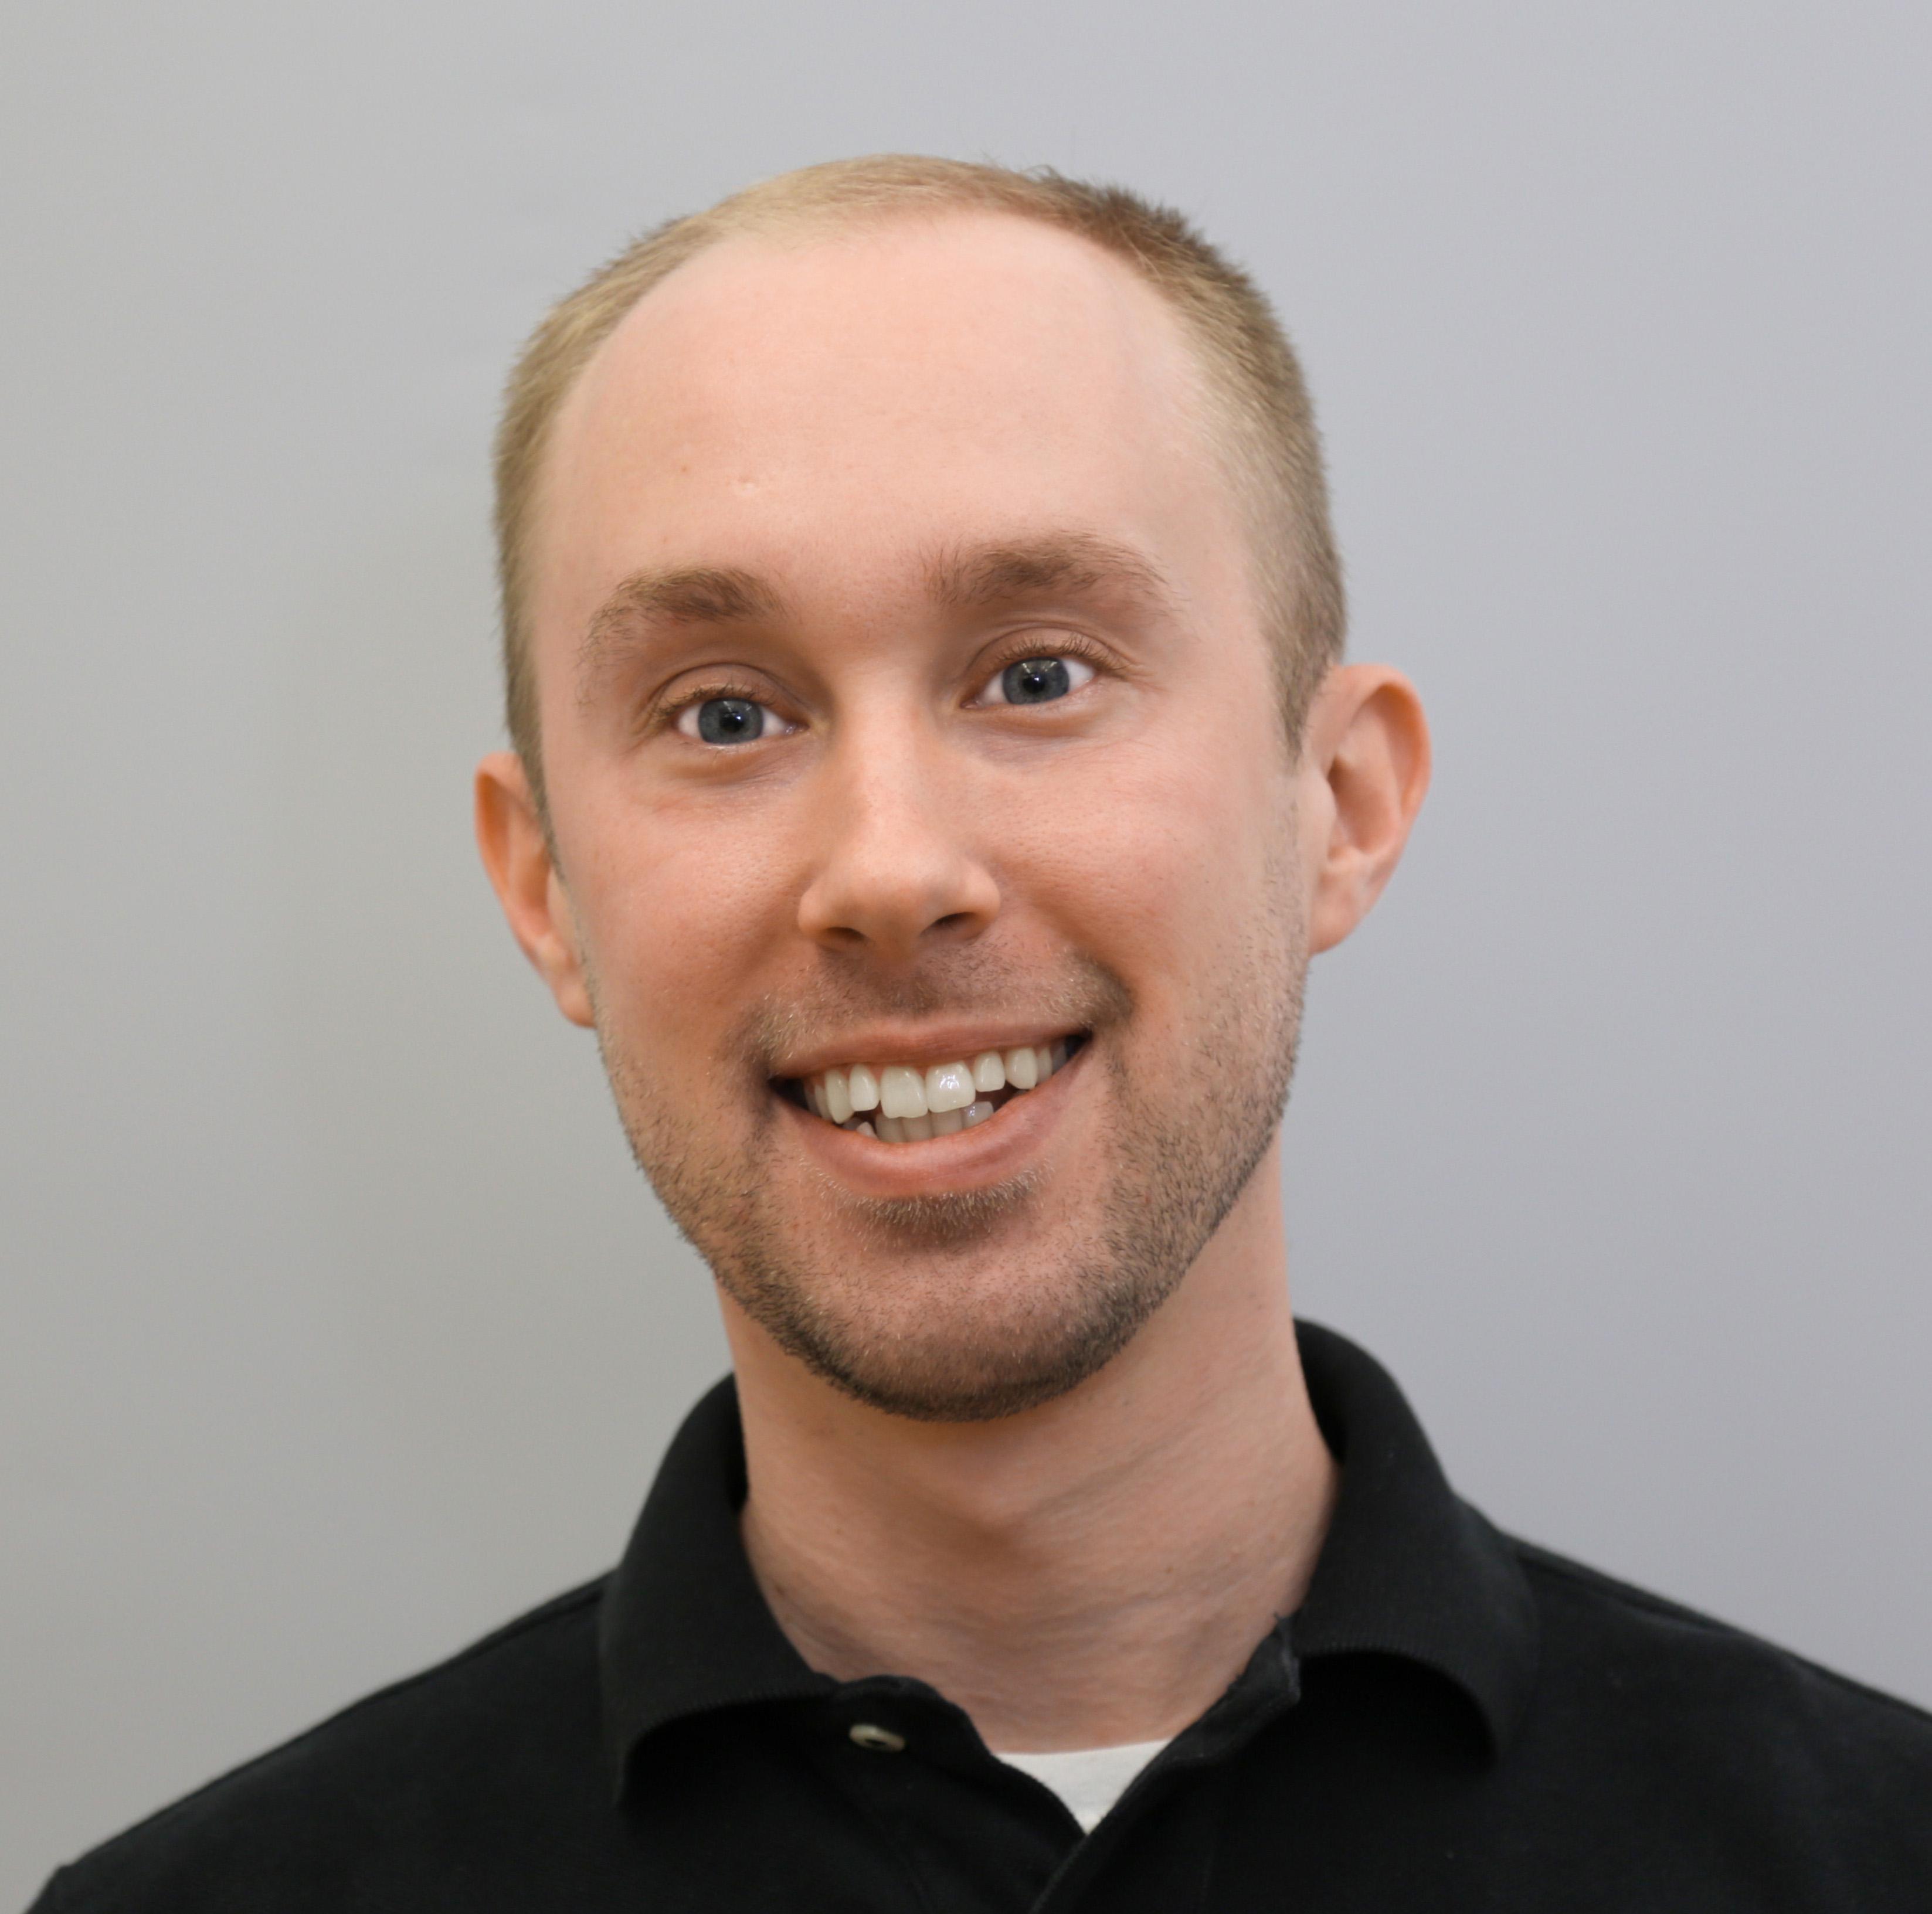 Ryan Brodhead - Vice President – Administration, Licensing & Royalties